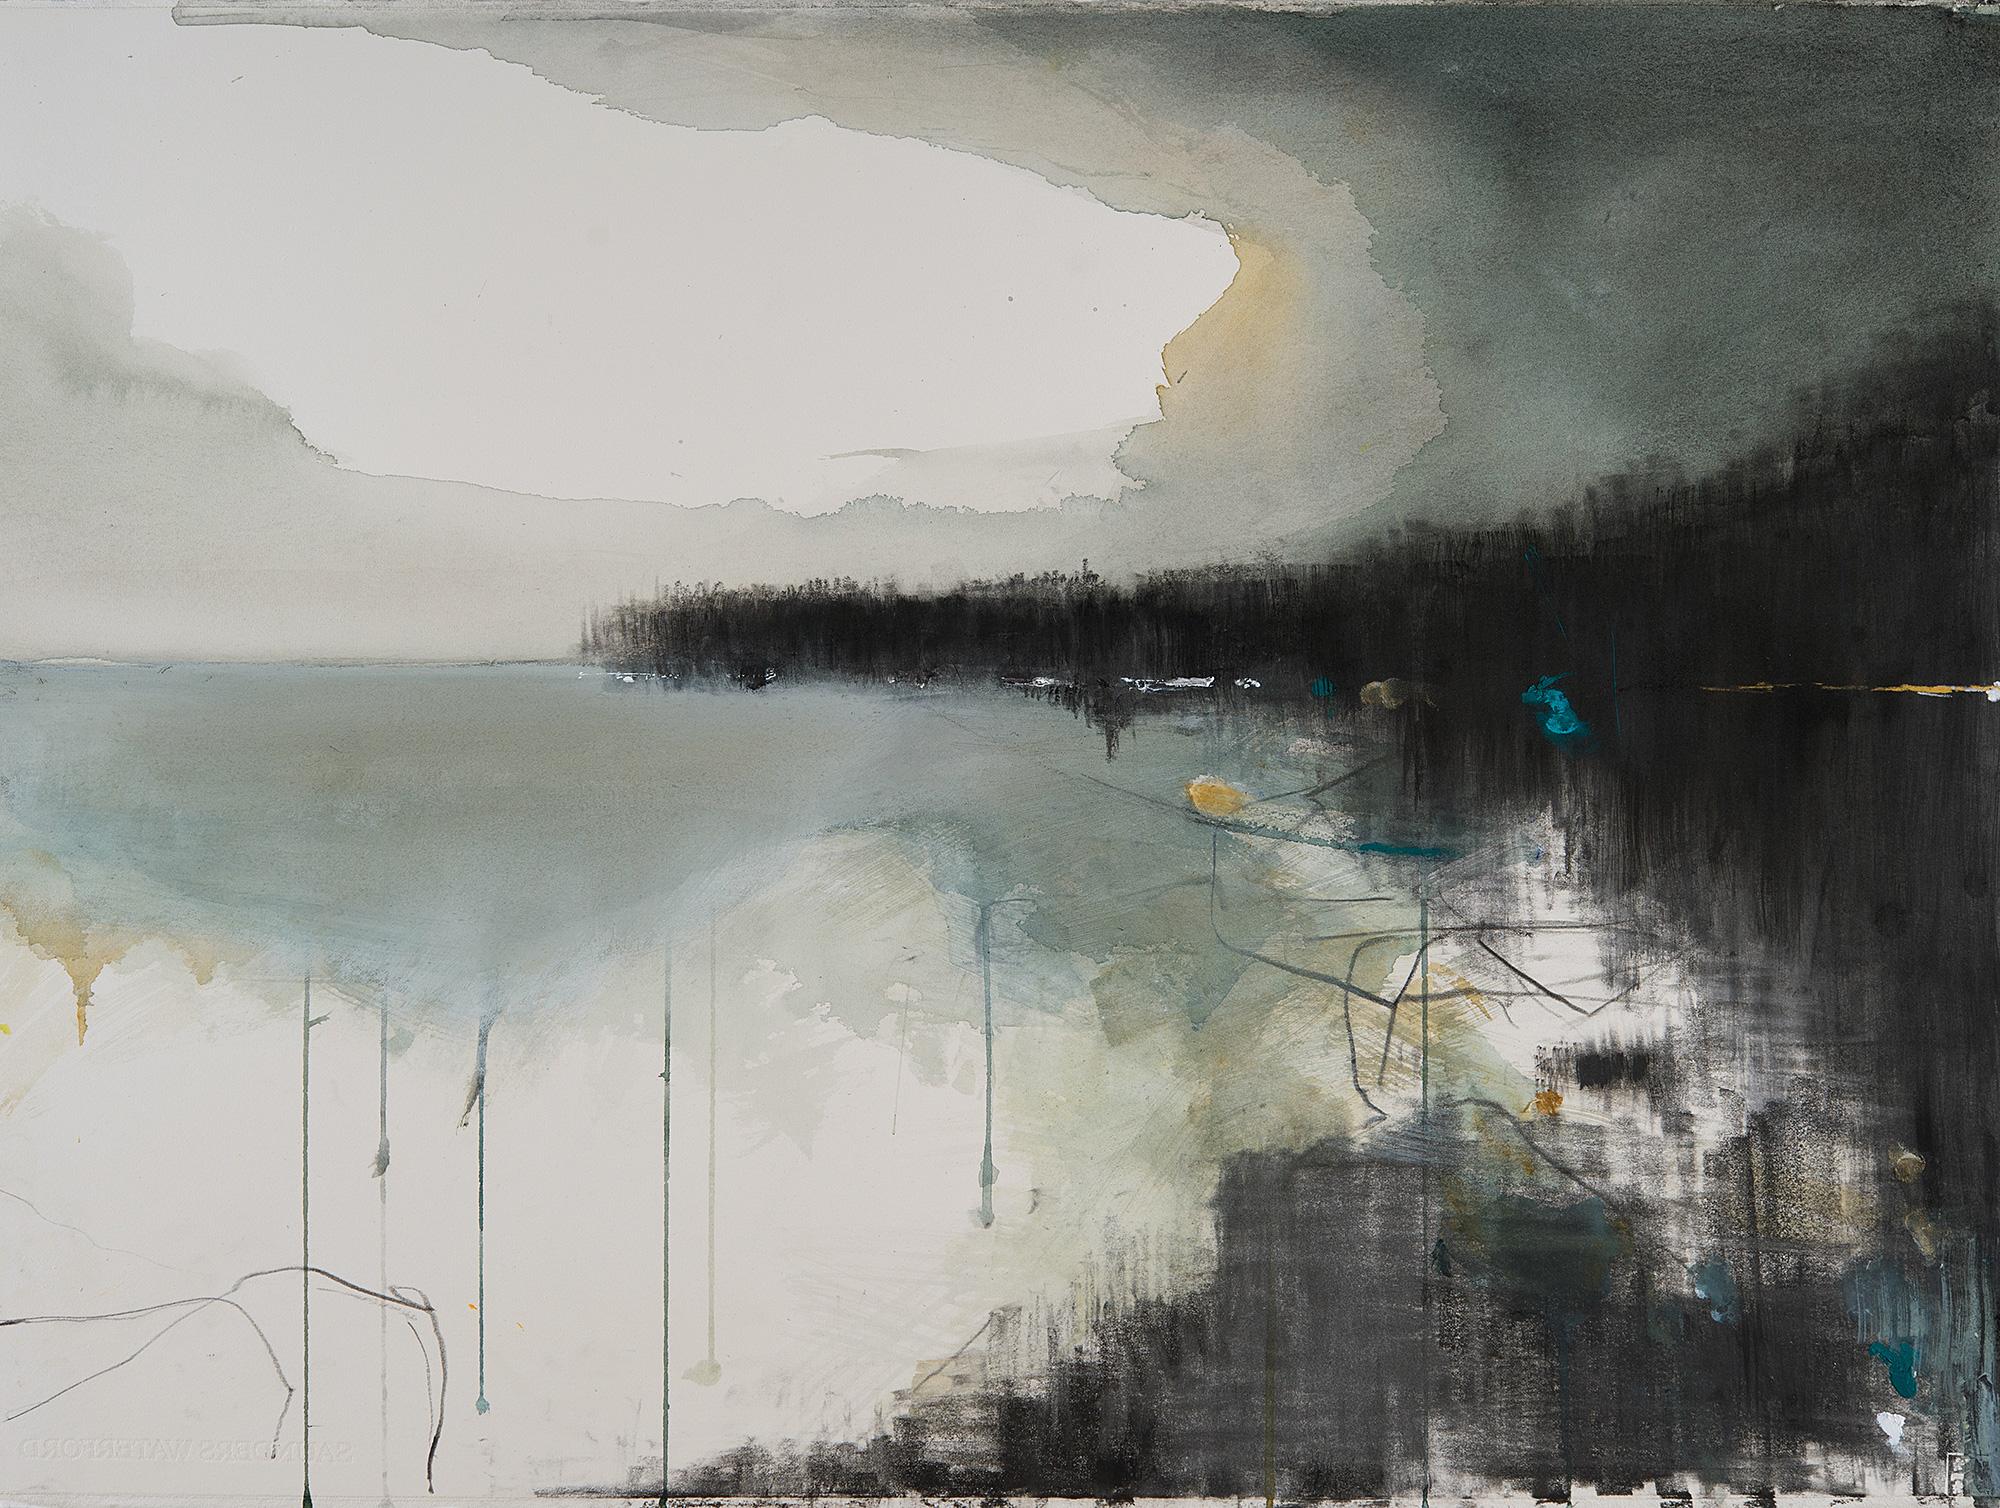 Green Seas,Rosemullion . Mixed media on paper.57 x 77cm  Sold